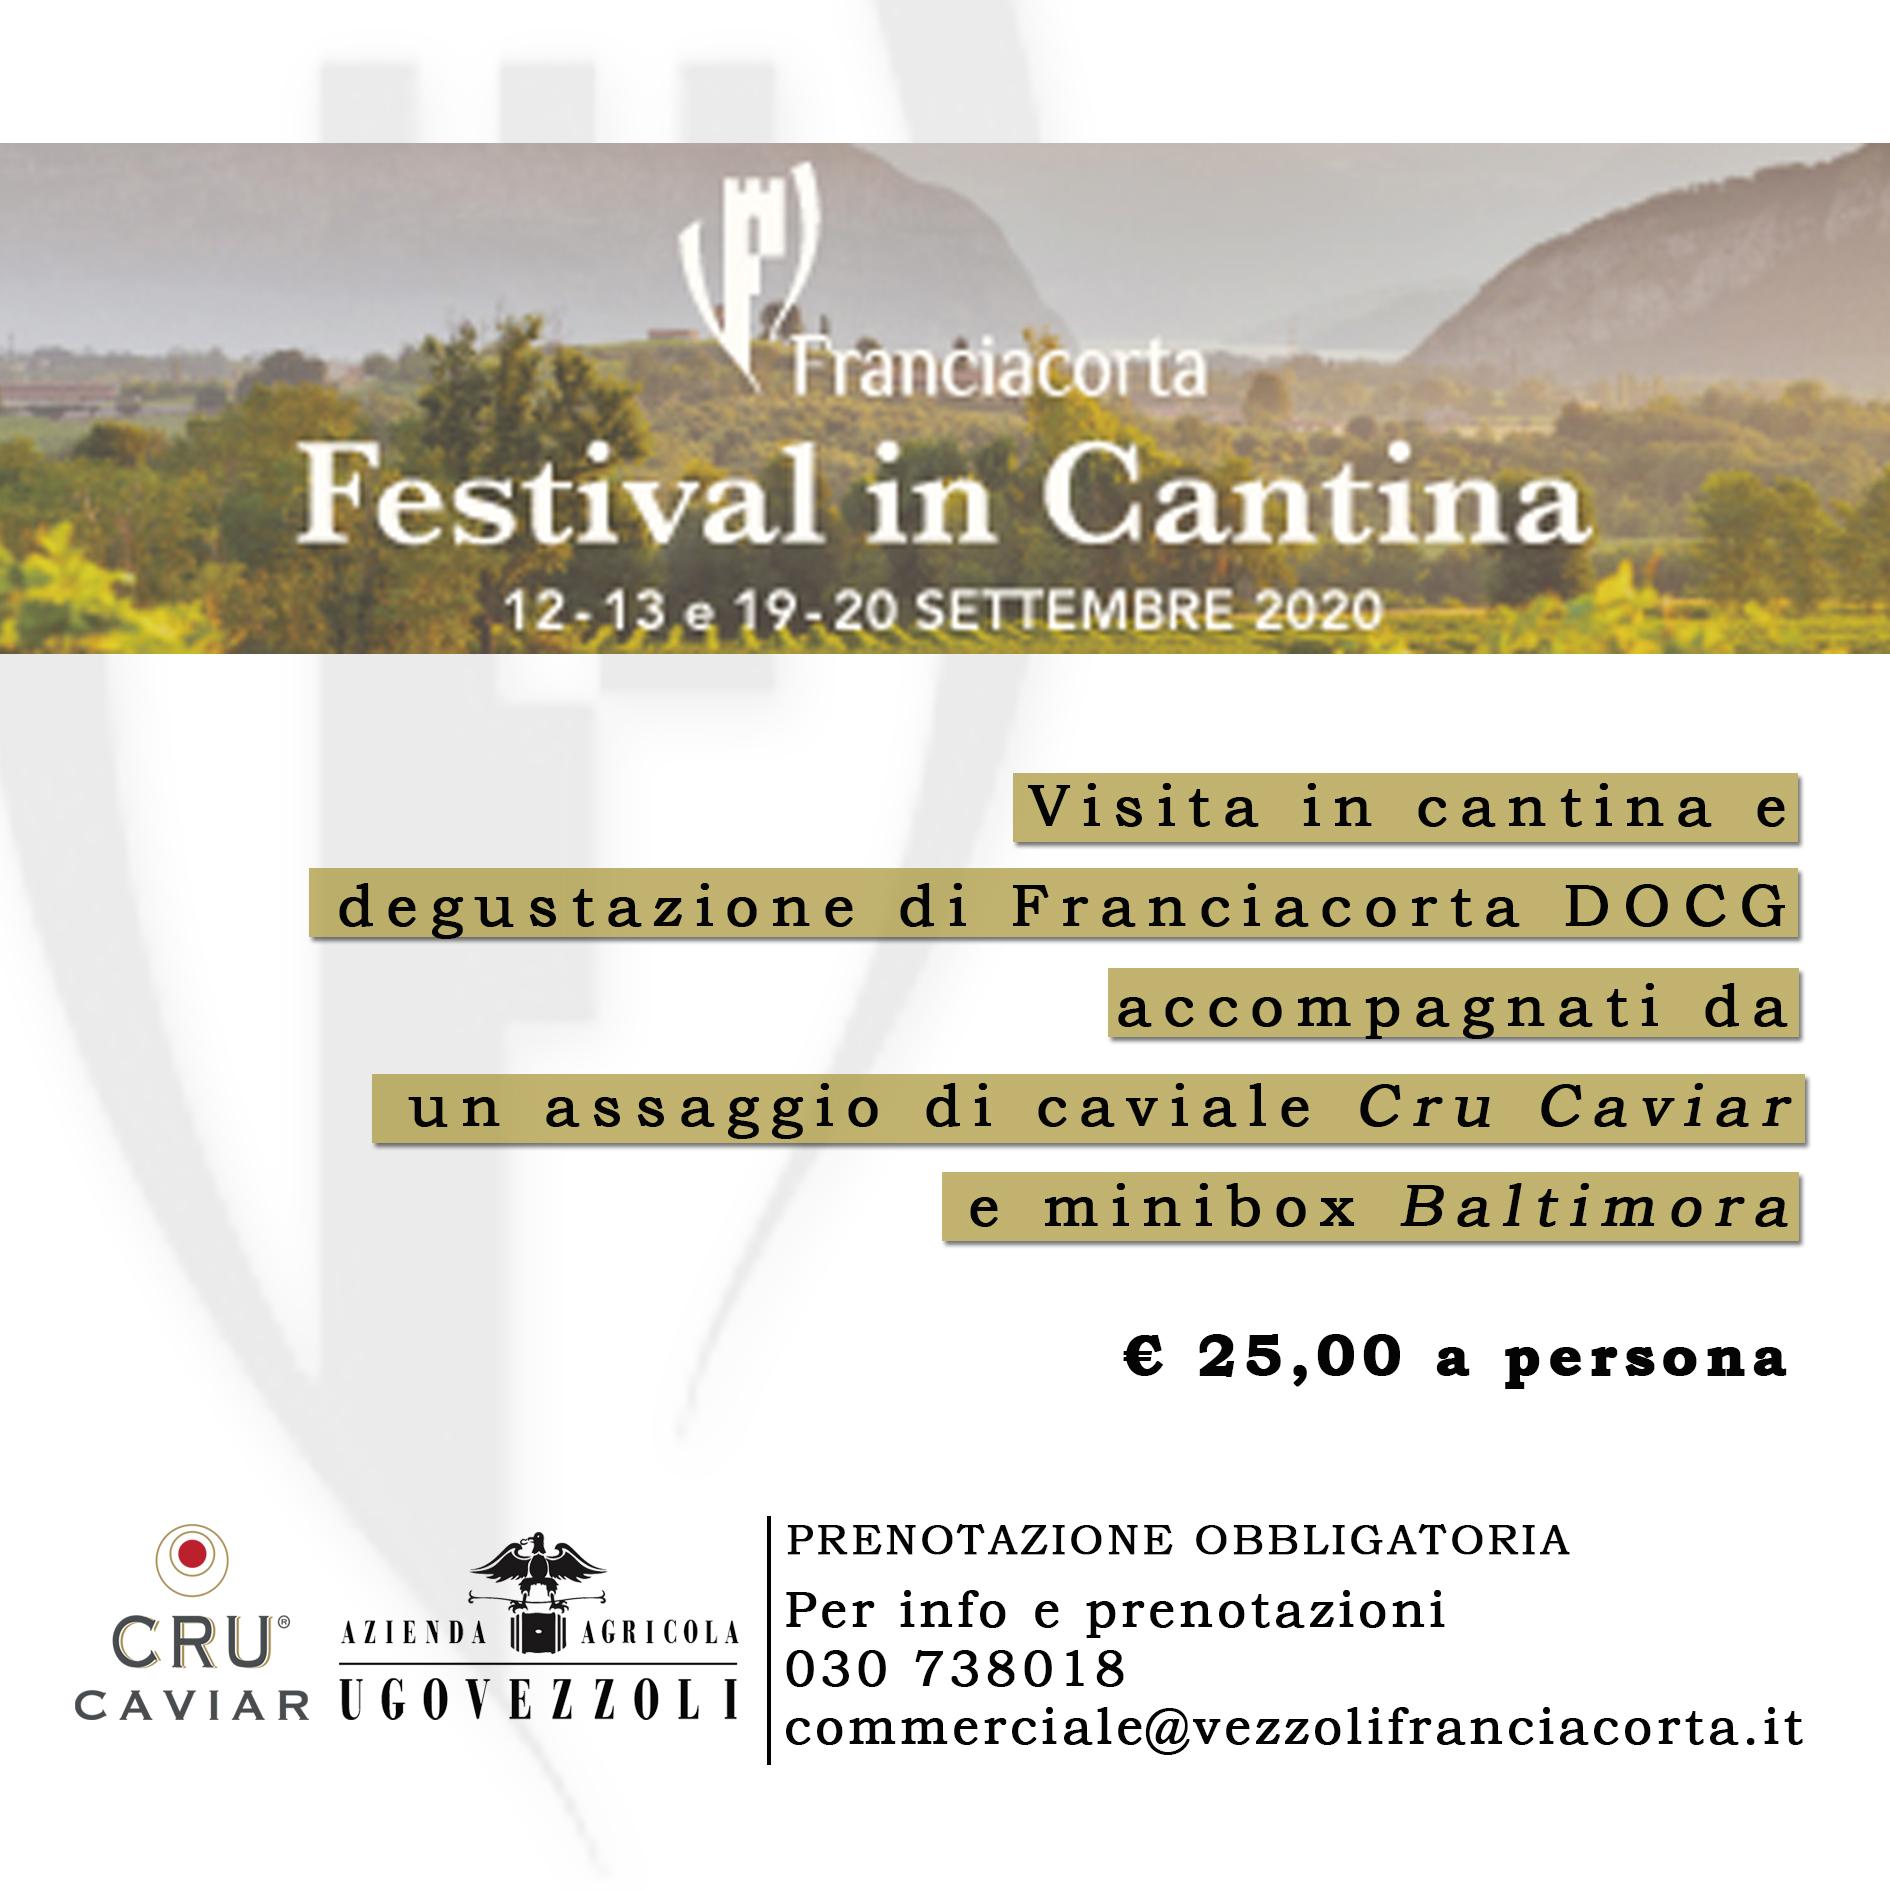 Degustazione Franciacorta e Cru Caviar Festival in Cantina Settembre 2020